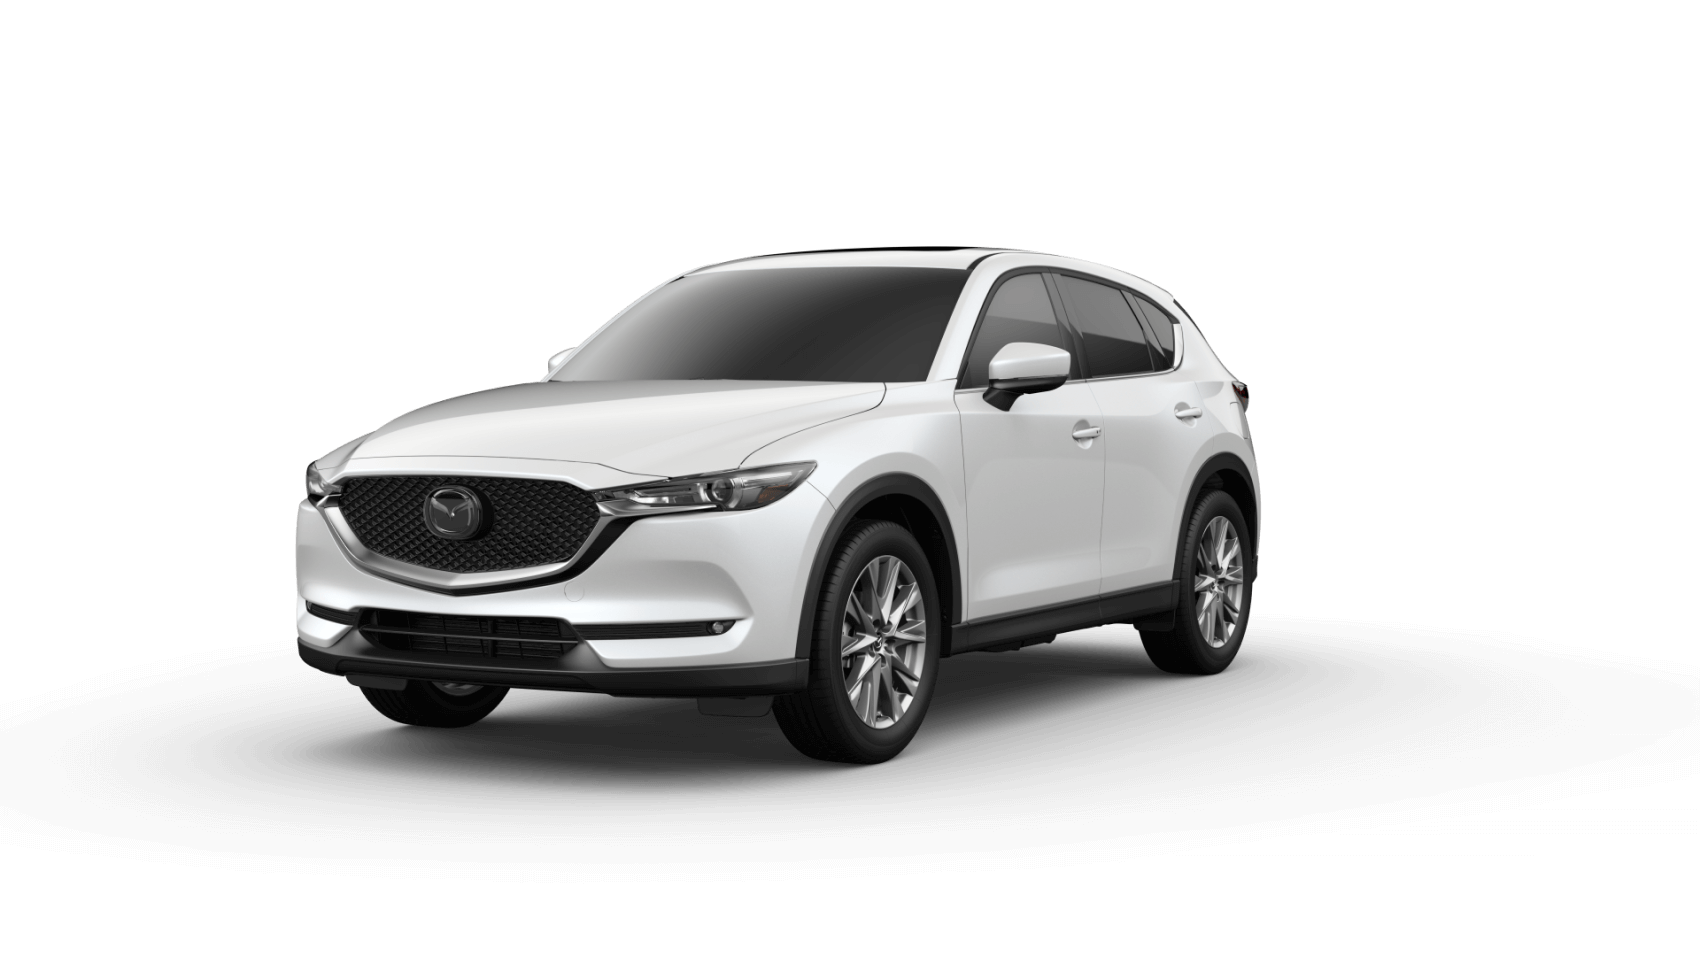 2021 Mazda CX-5 Grand Touring Snowflake White Pearl Ocean Mazda